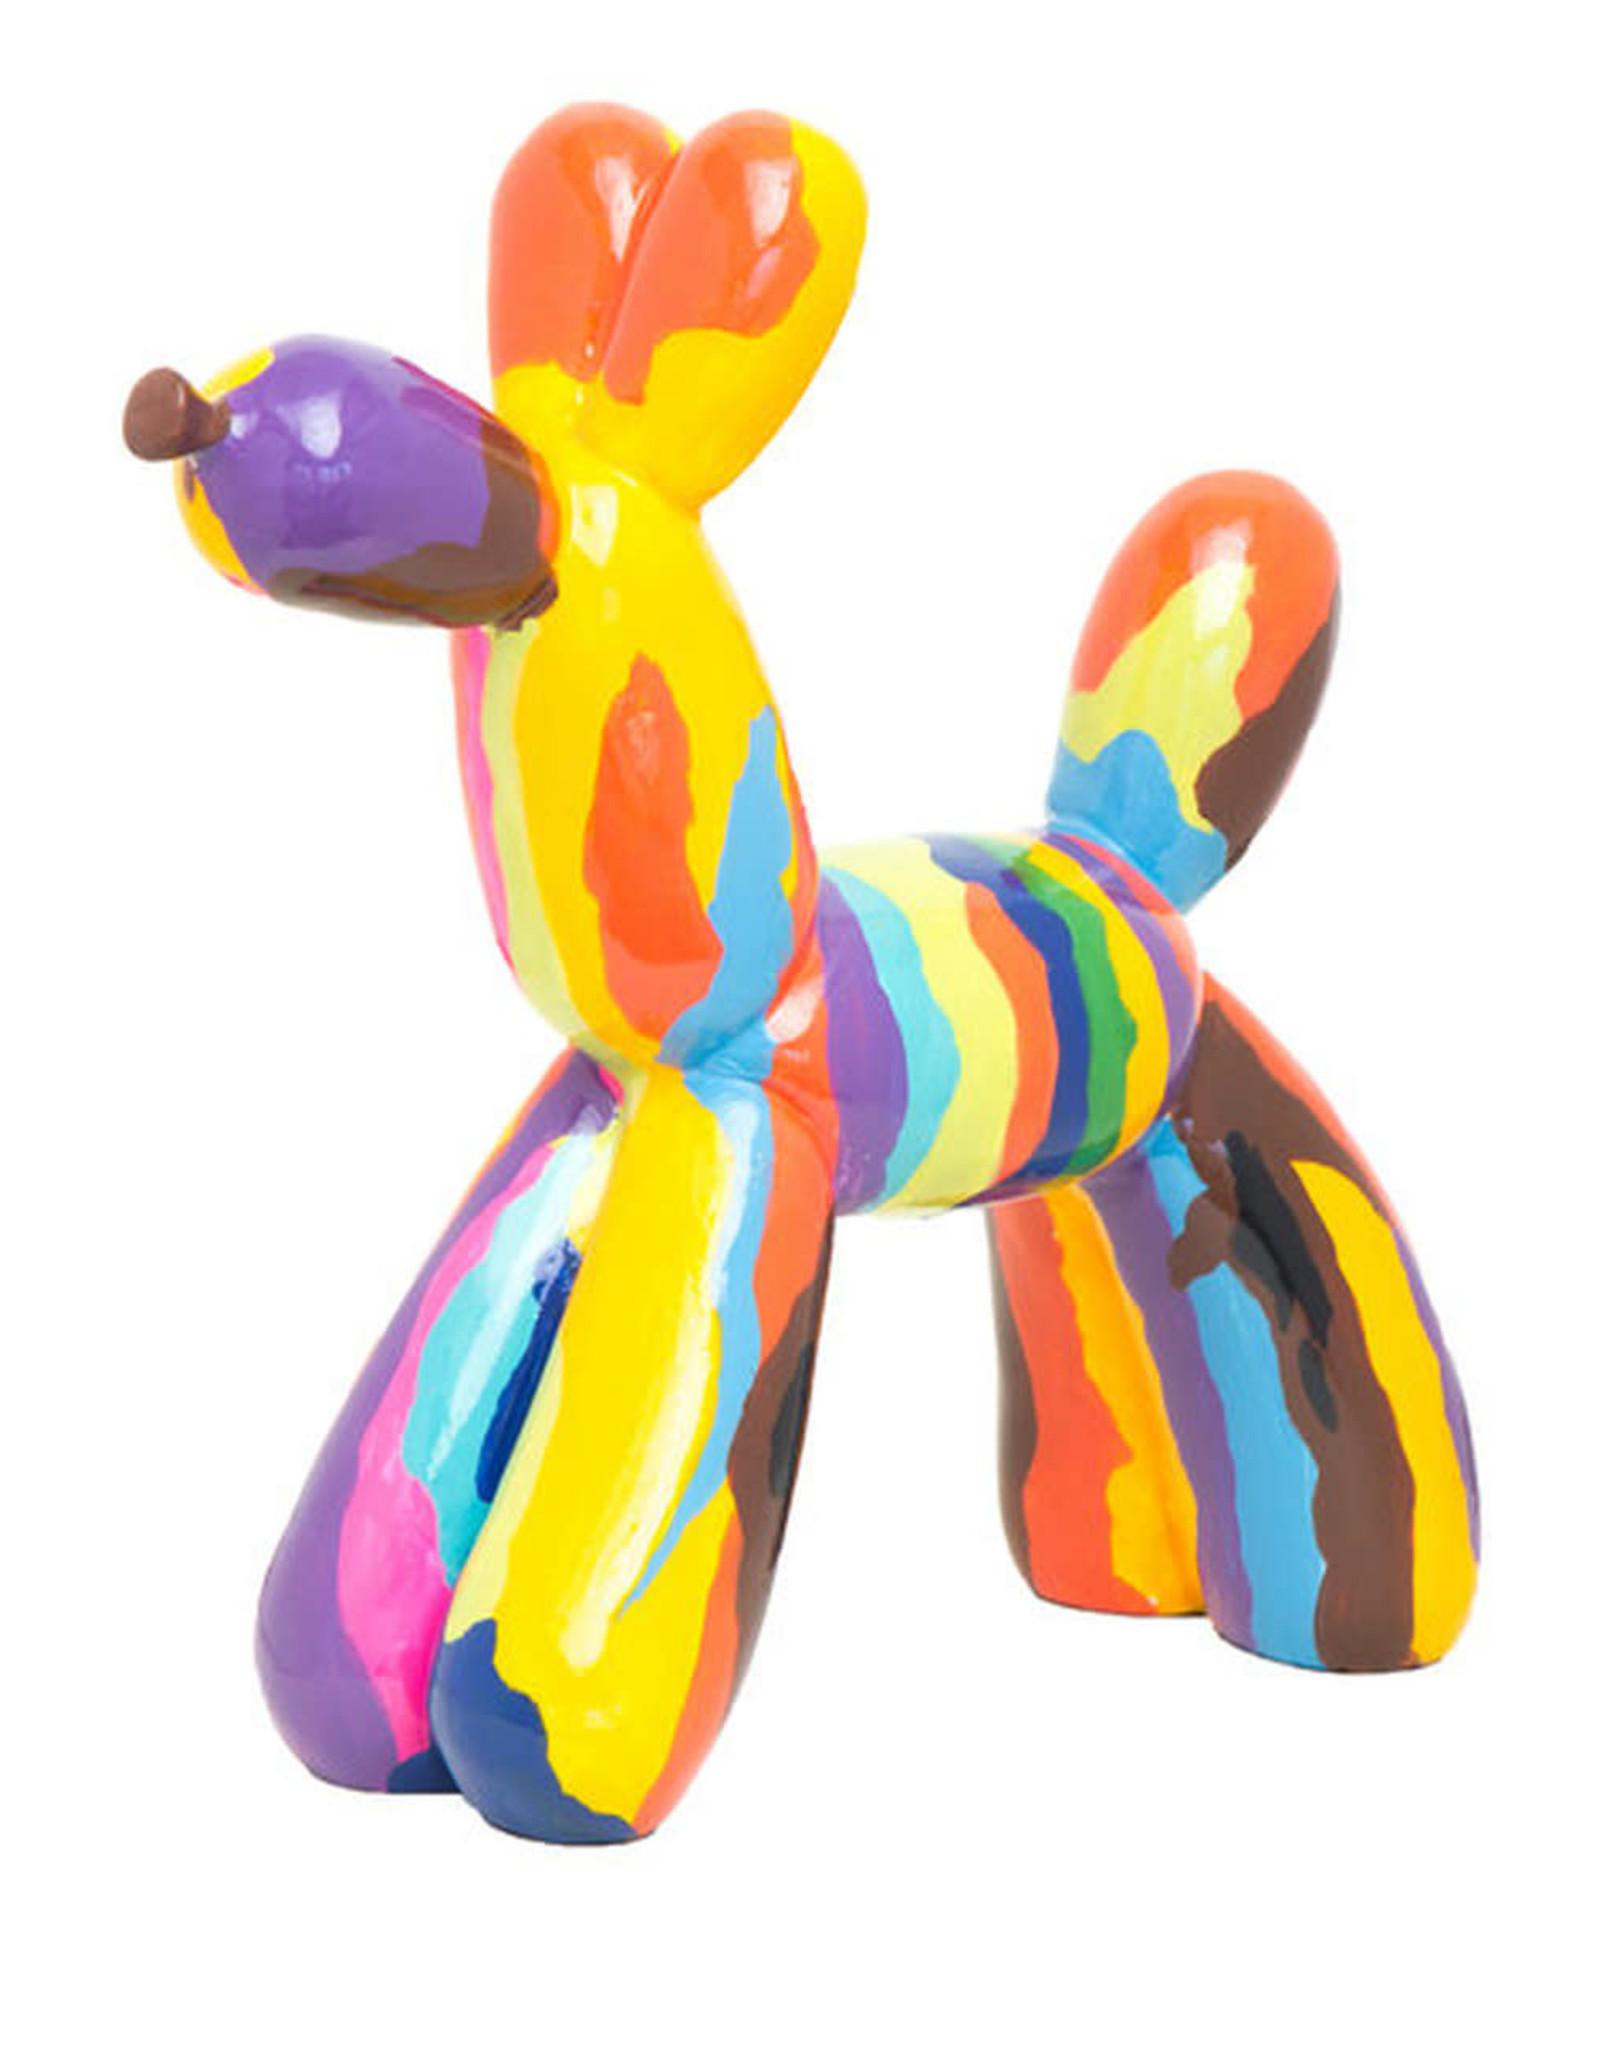 "Interior Illusions 12"" Graffiti Balloon Dog Sculpture"